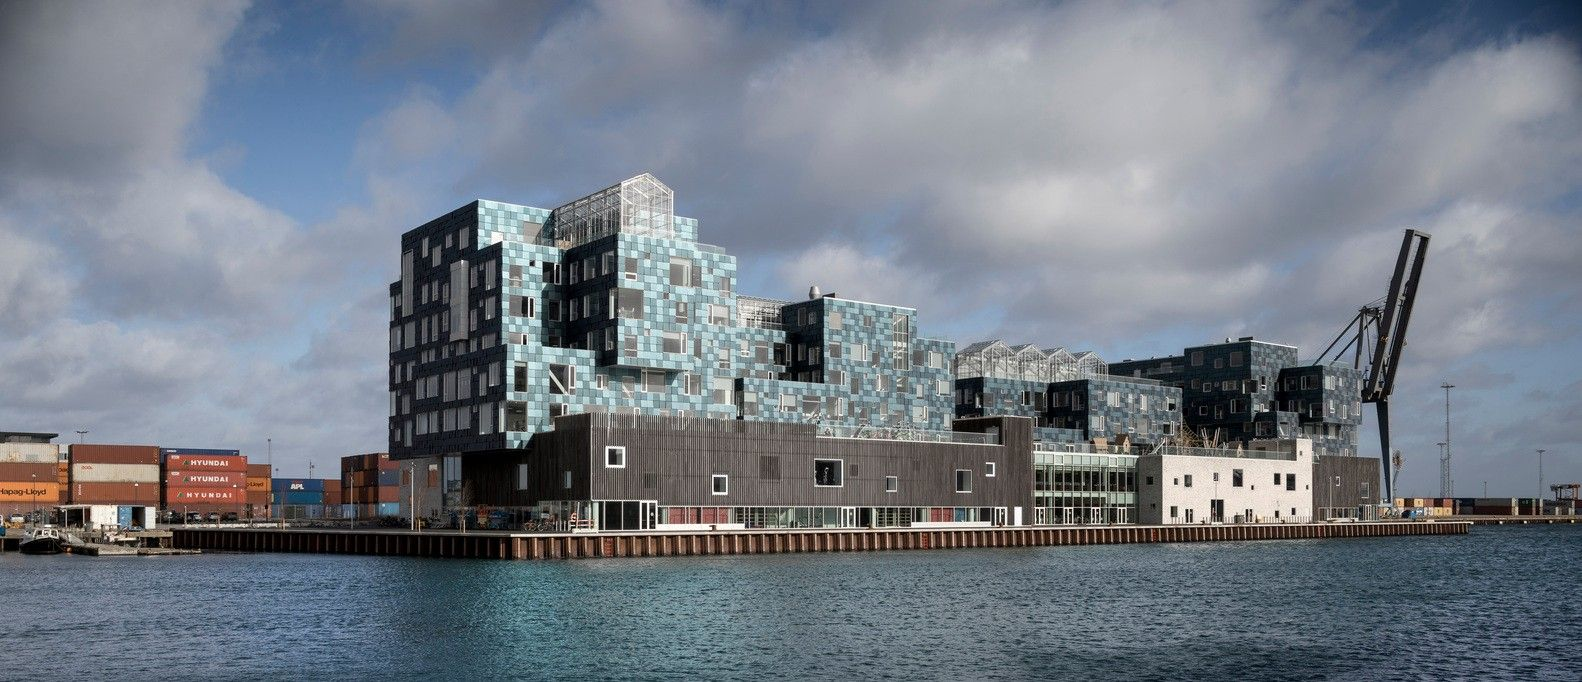 CIS Nordhavn国际学标设计